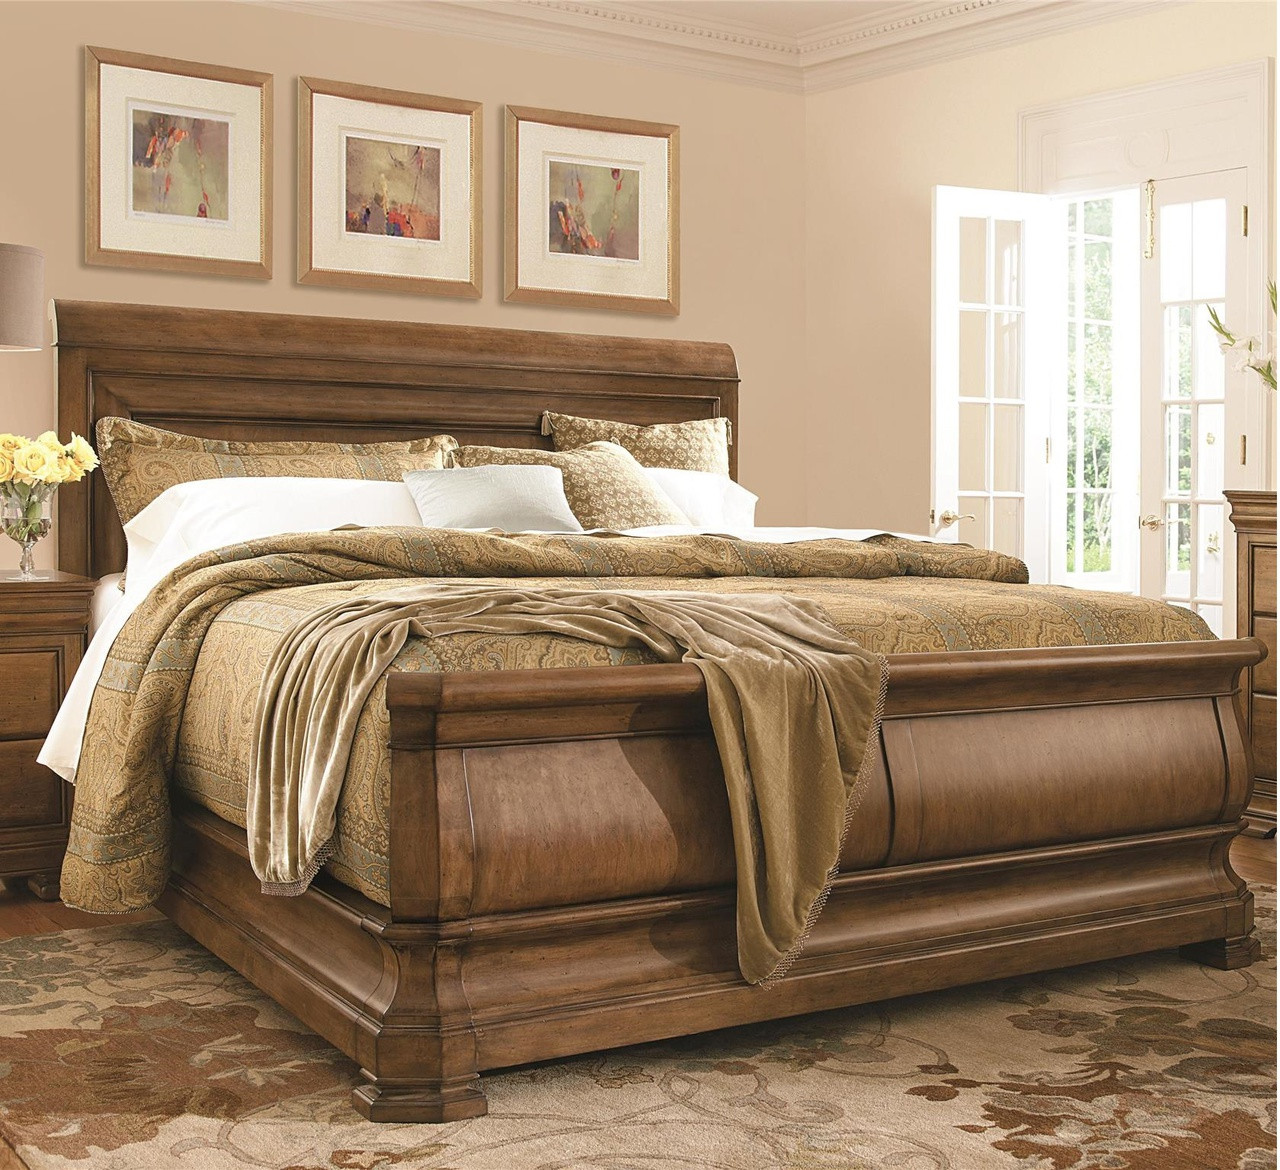 Fantastic Louis Philippe Solid Wood King Sleigh Bed - Cognac | Zin Home SL71